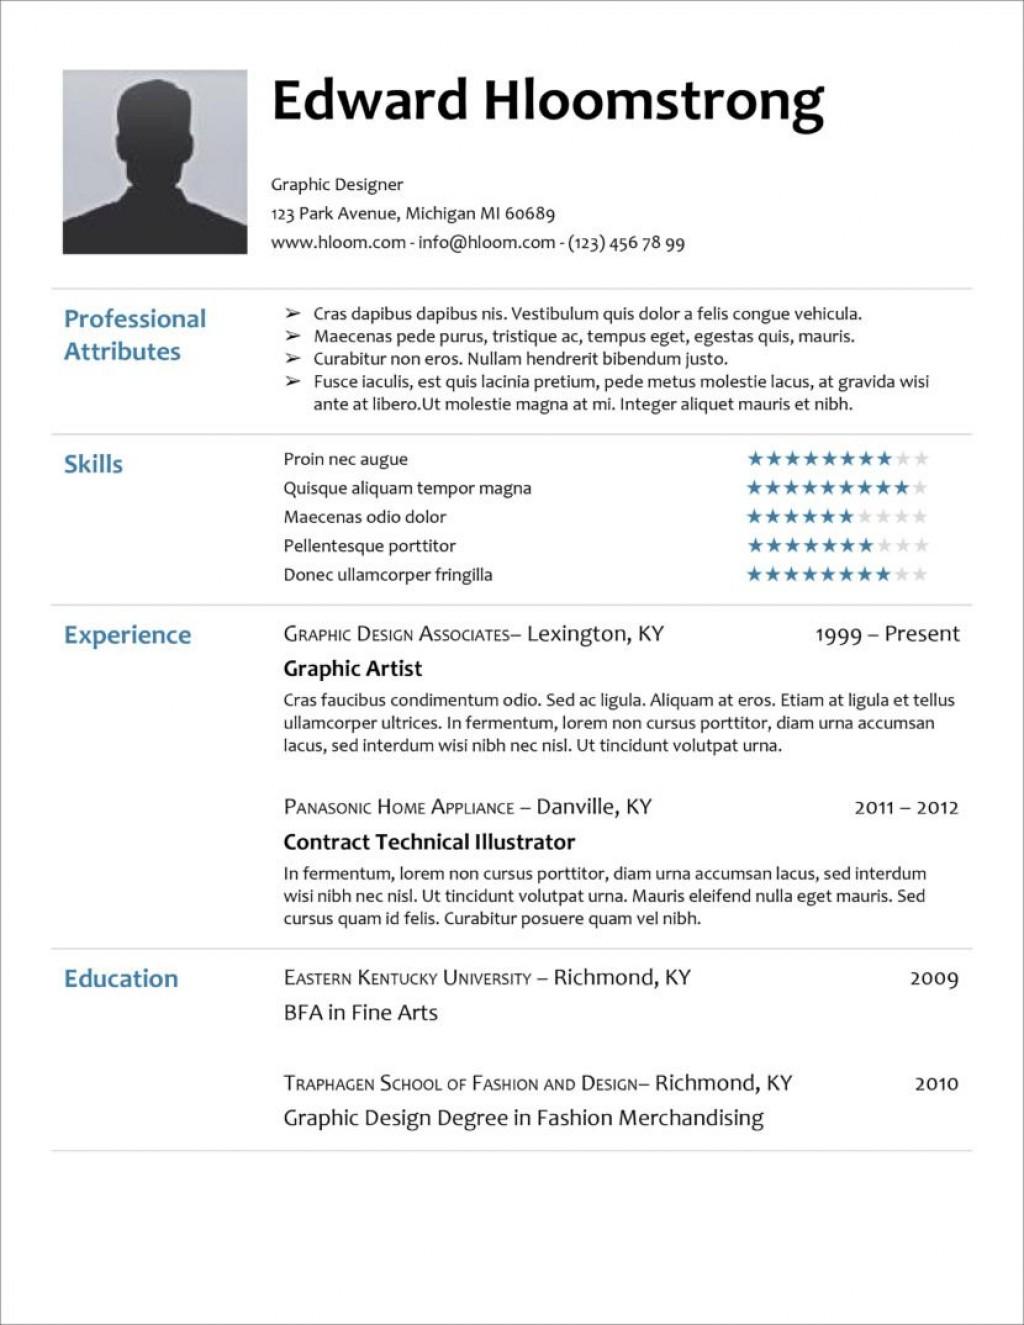 006 Remarkable Free Resume Template Microsoft Word 2010 Highest Clarity  Cv DownloadLarge